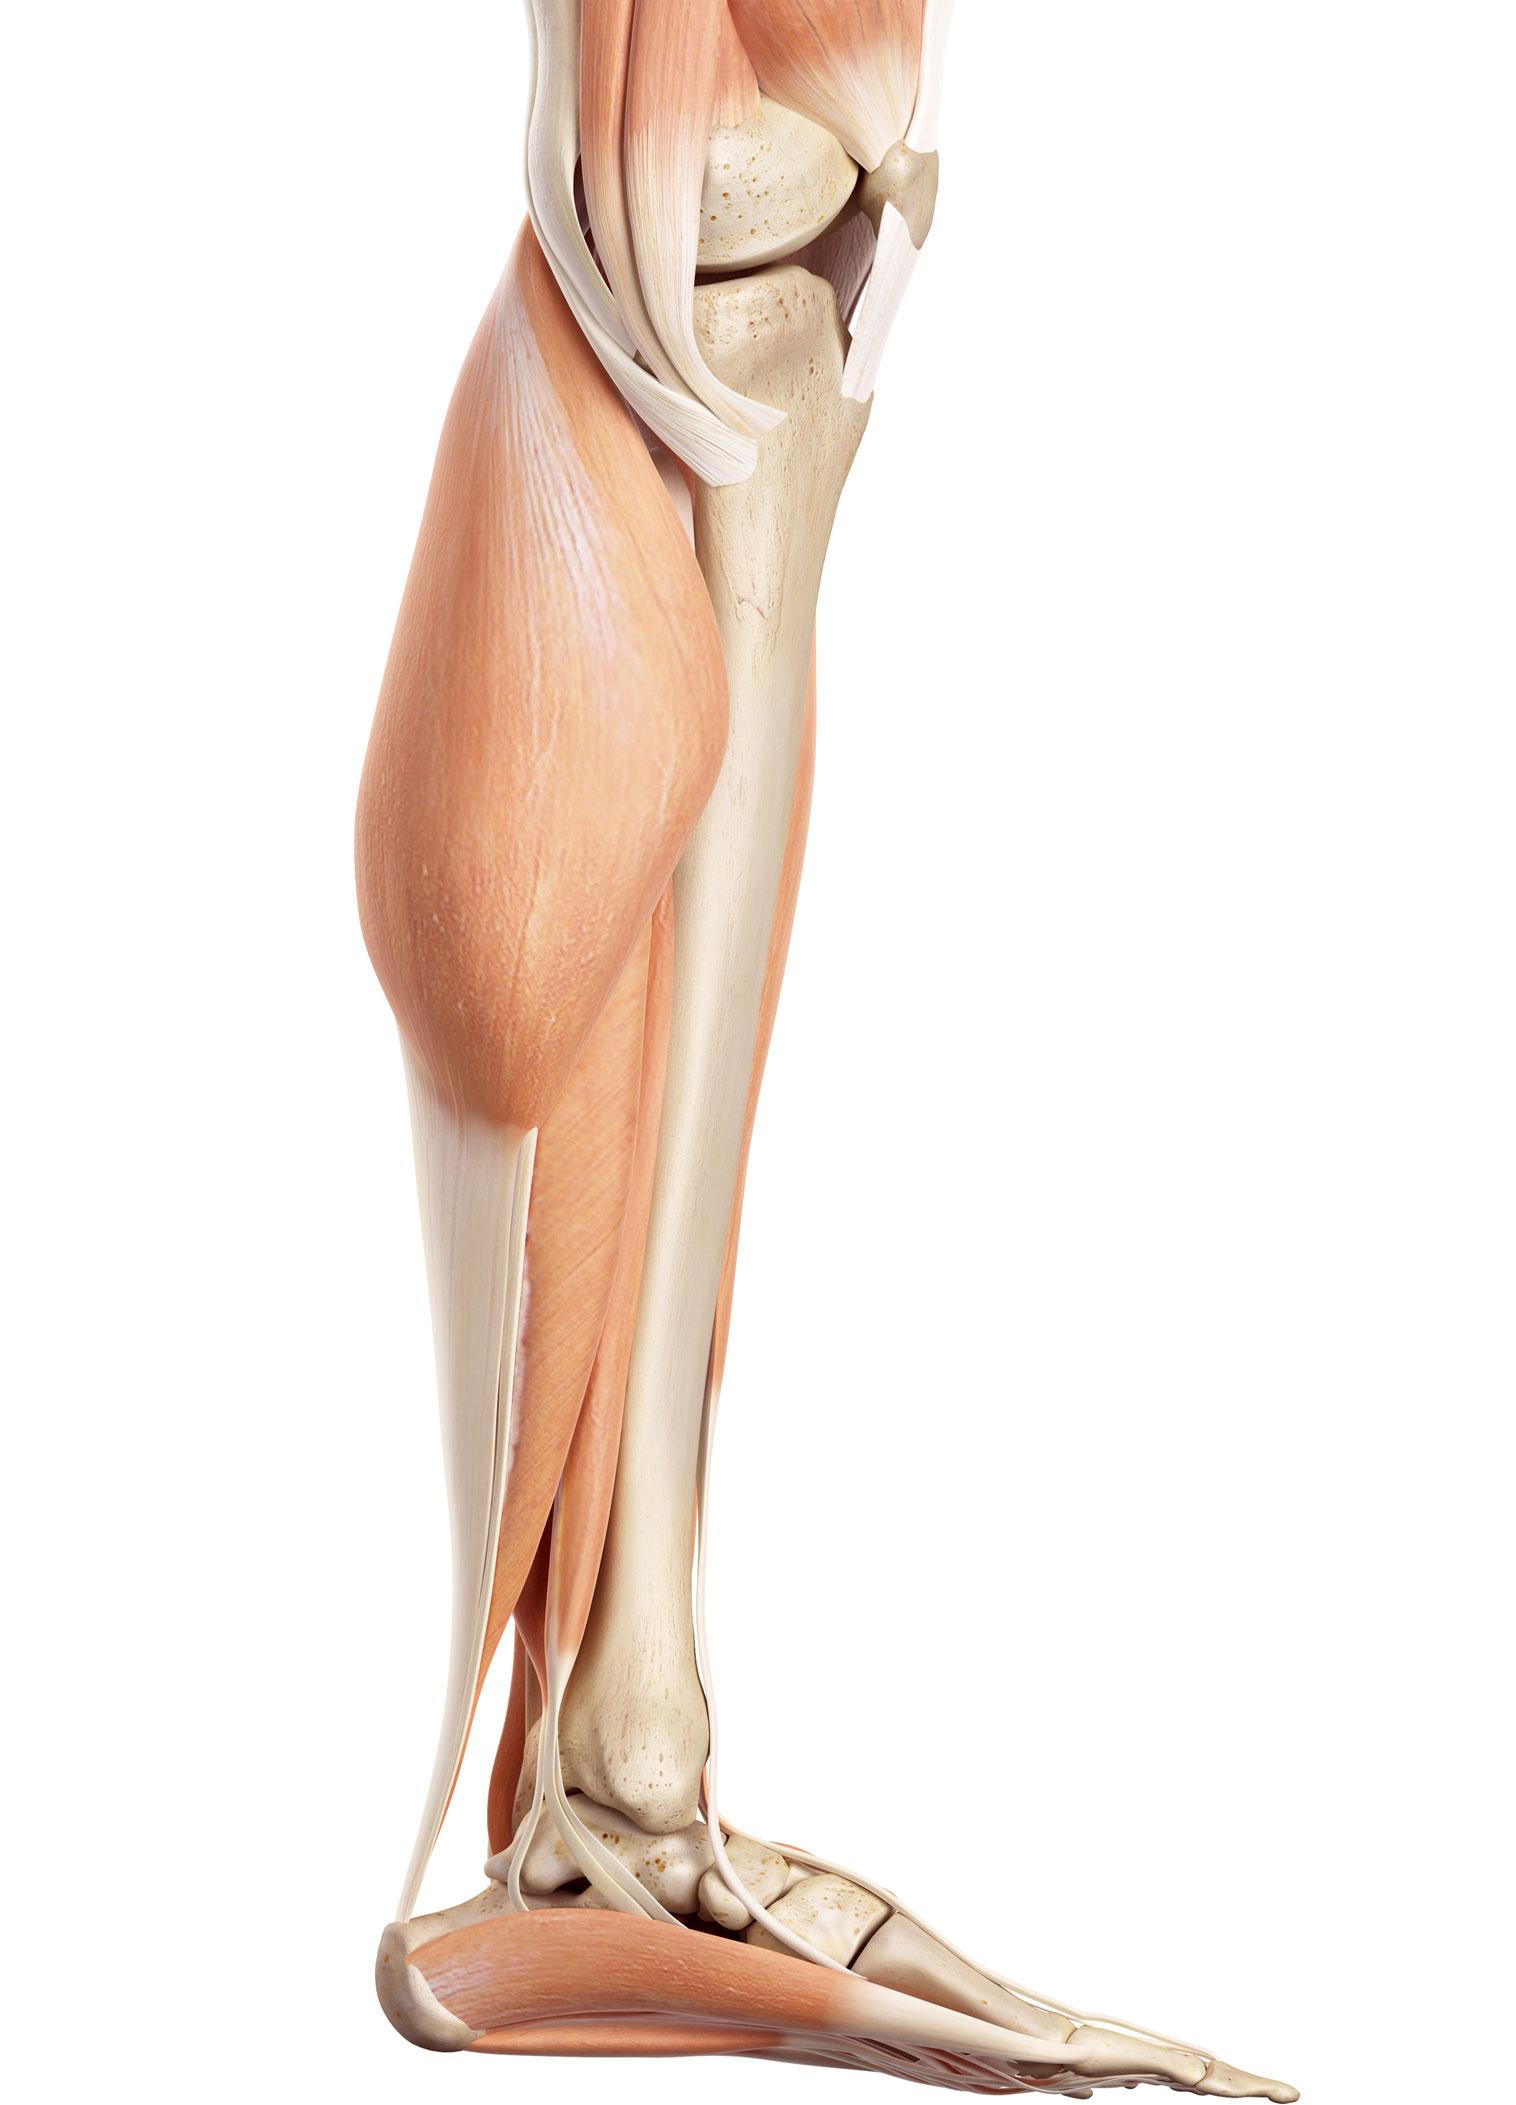 Knieschmerzen - Schmerzen im Knie Behandlung - EIM Praxis ...